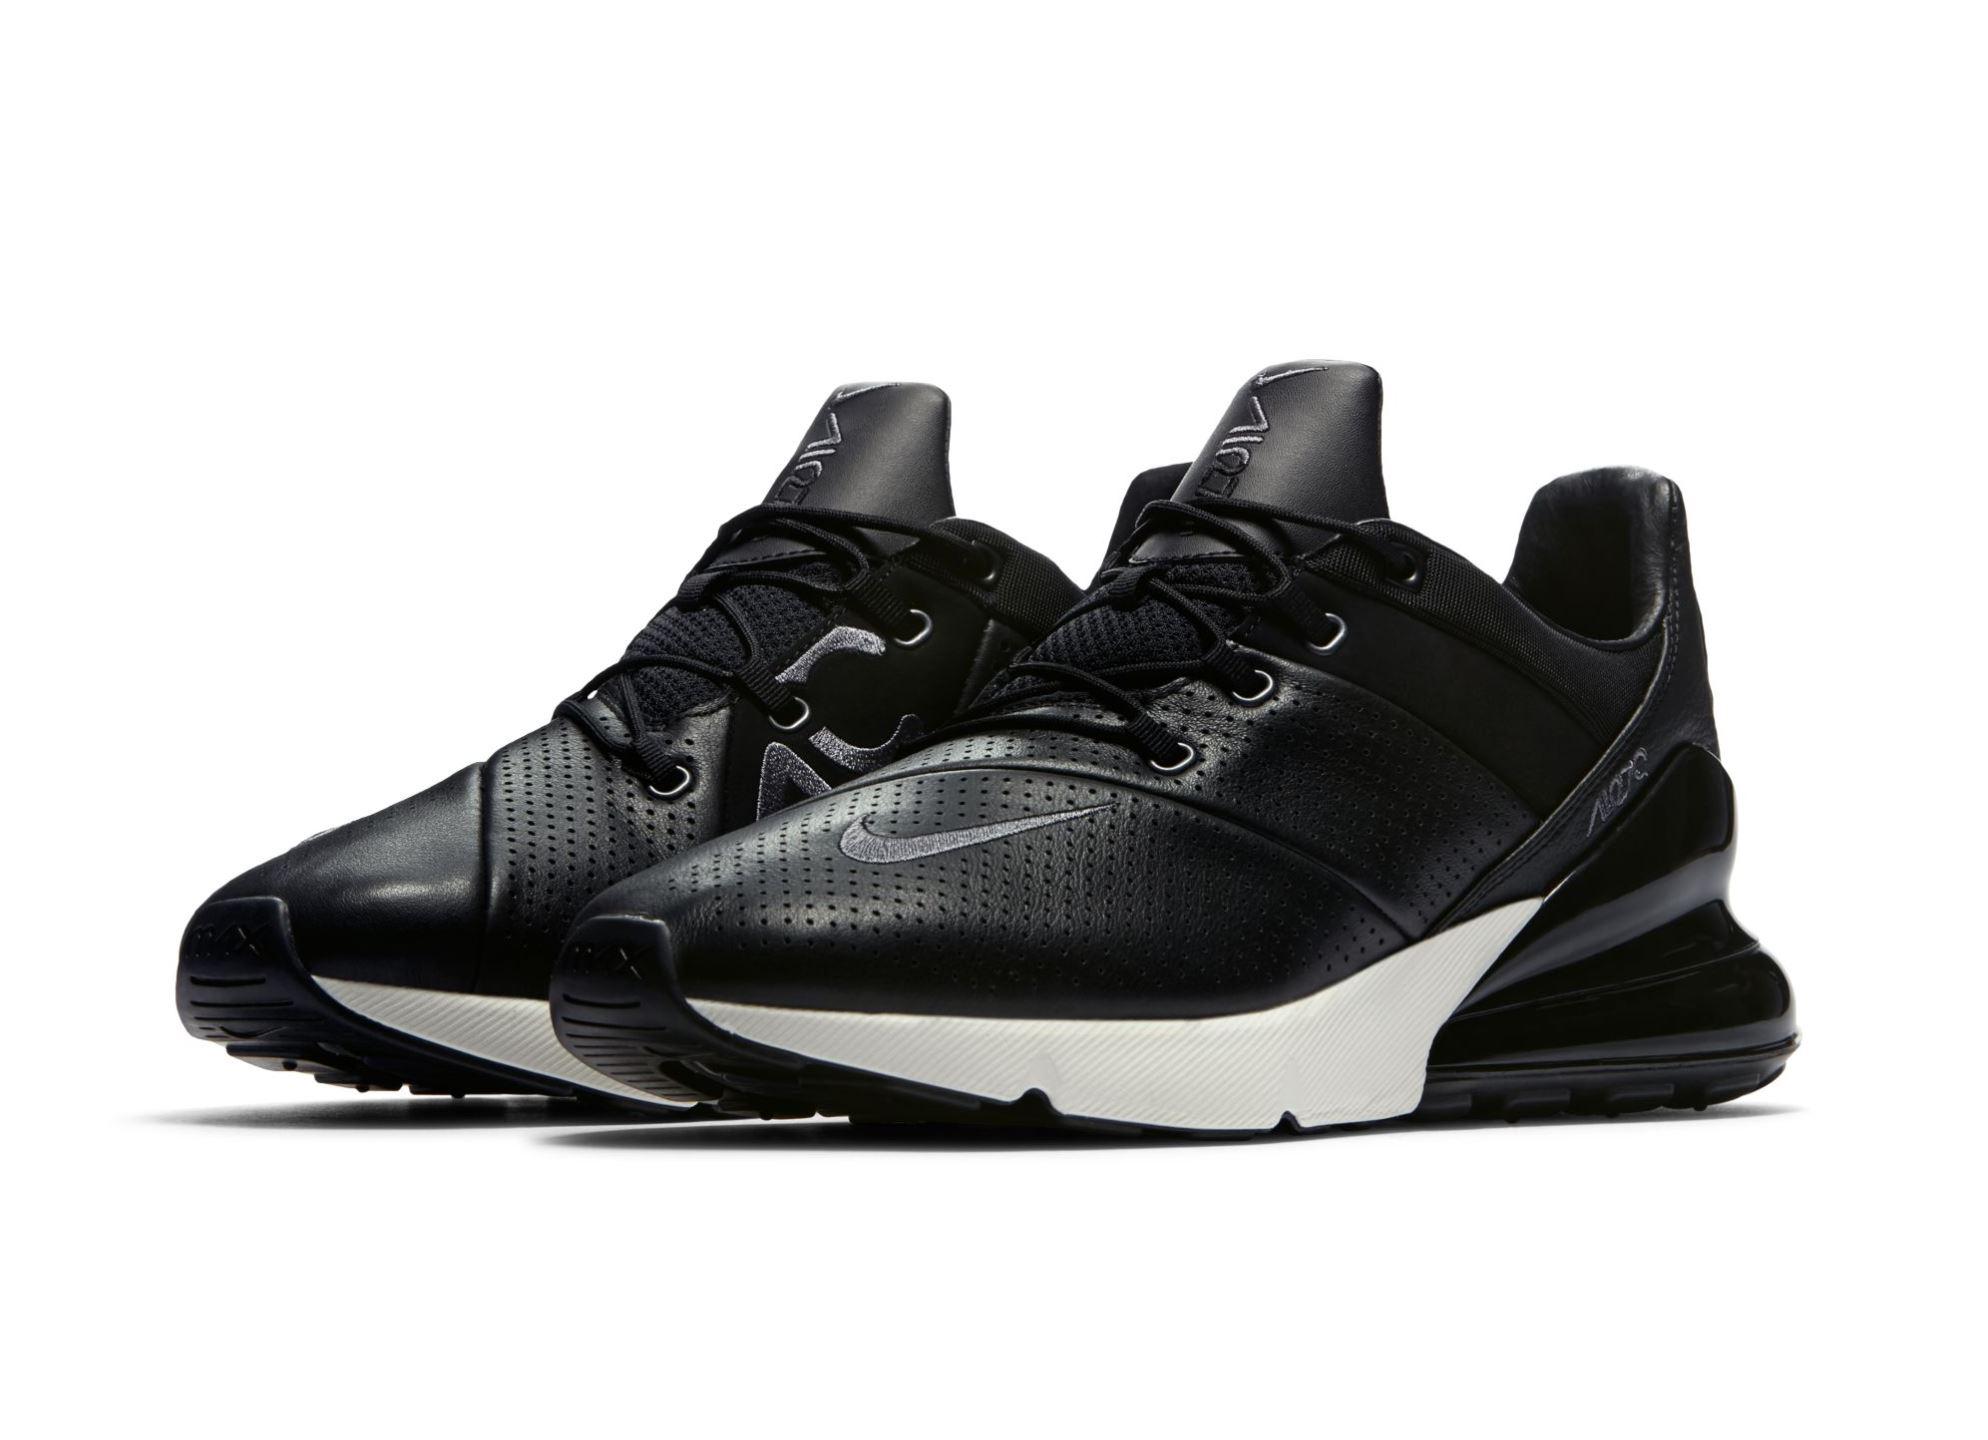 Advanced Design Nike Free RN 2017 Black White Dark Grey Noir Gris Fonce 880839 001 Men's Running Shoes Sneaker 880839 001